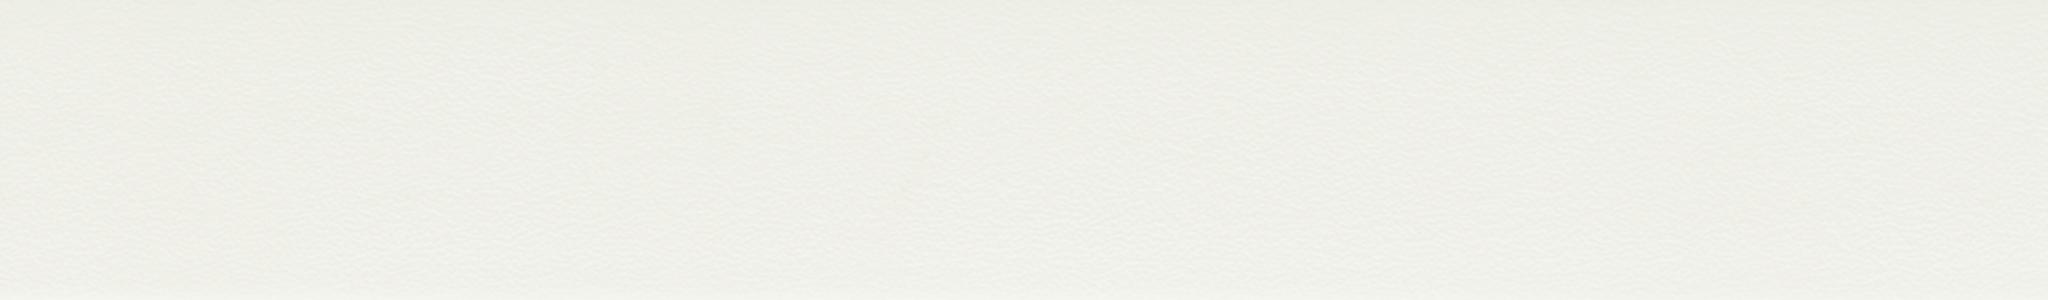 HU 17359 ABS Edge Light Grey Pearl 101